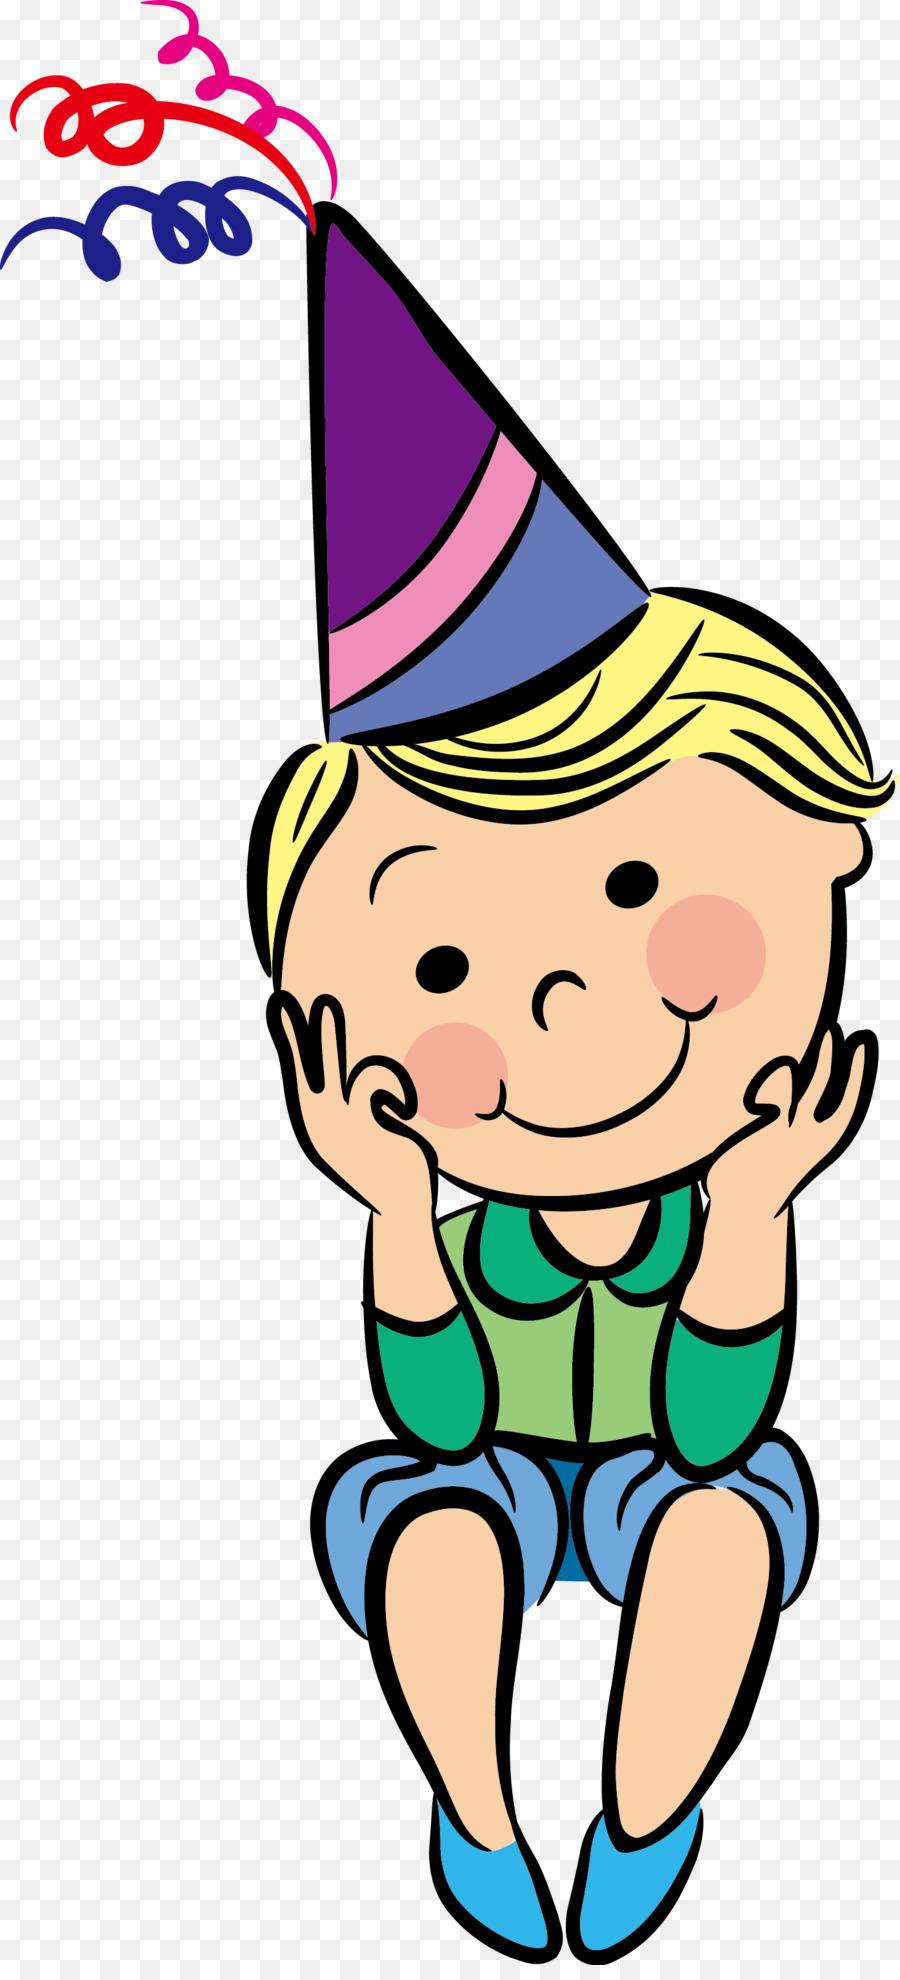 Cartoon Geburtstag Vektor Kind Geburtstag Png Herunterladen 1395